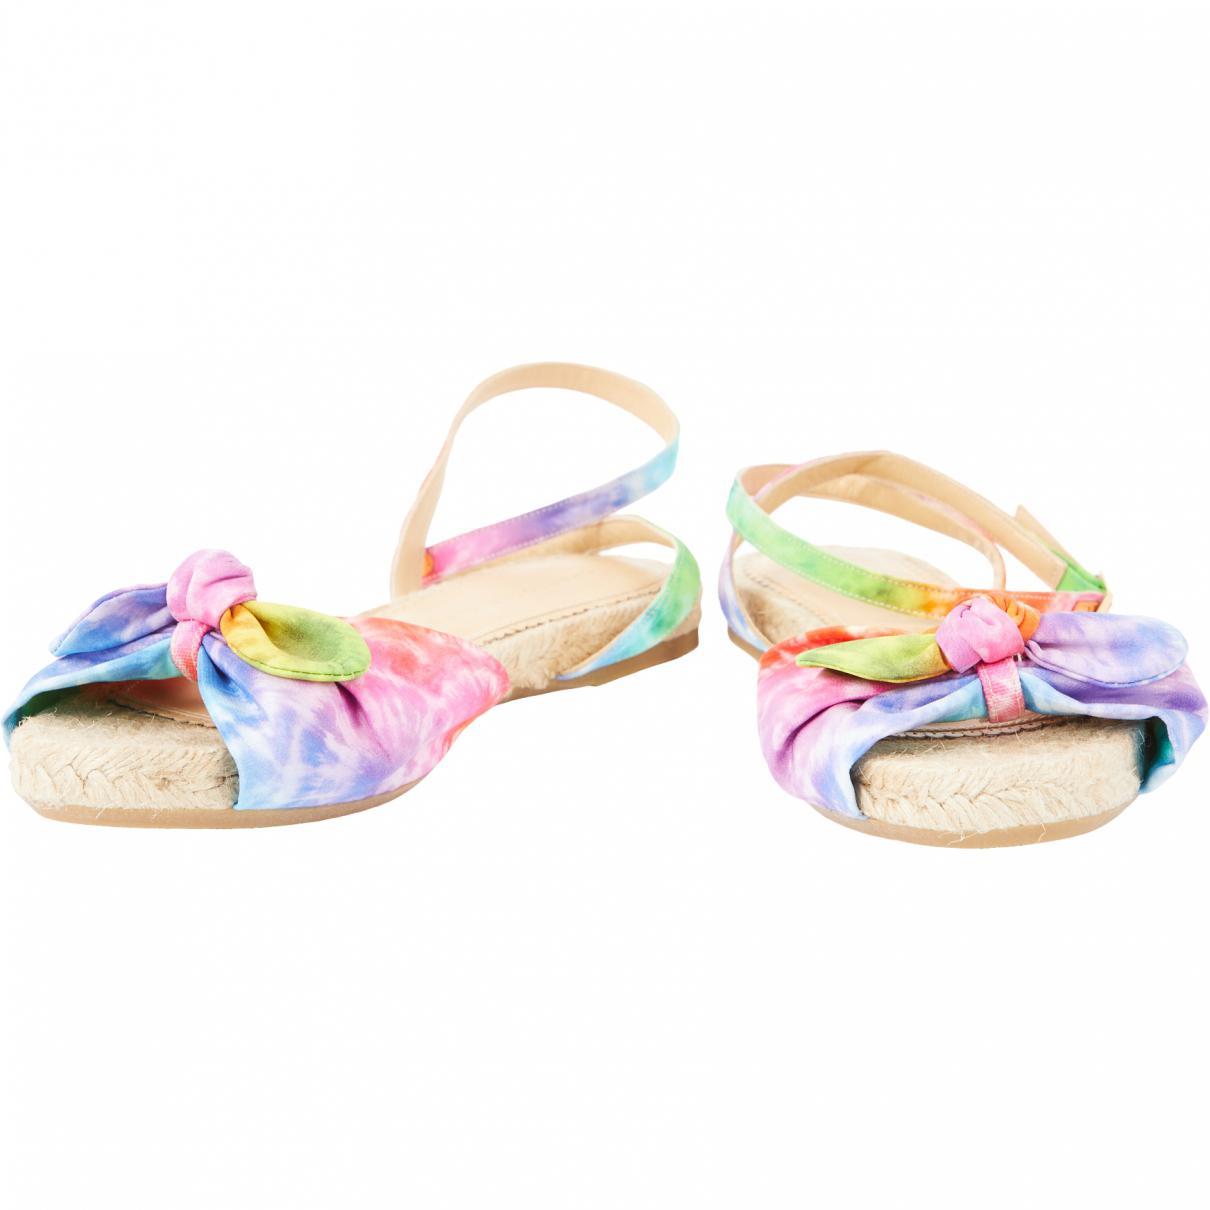 Pre-owned - Cloth sandal Charlotte Olympia 00C1gxWu